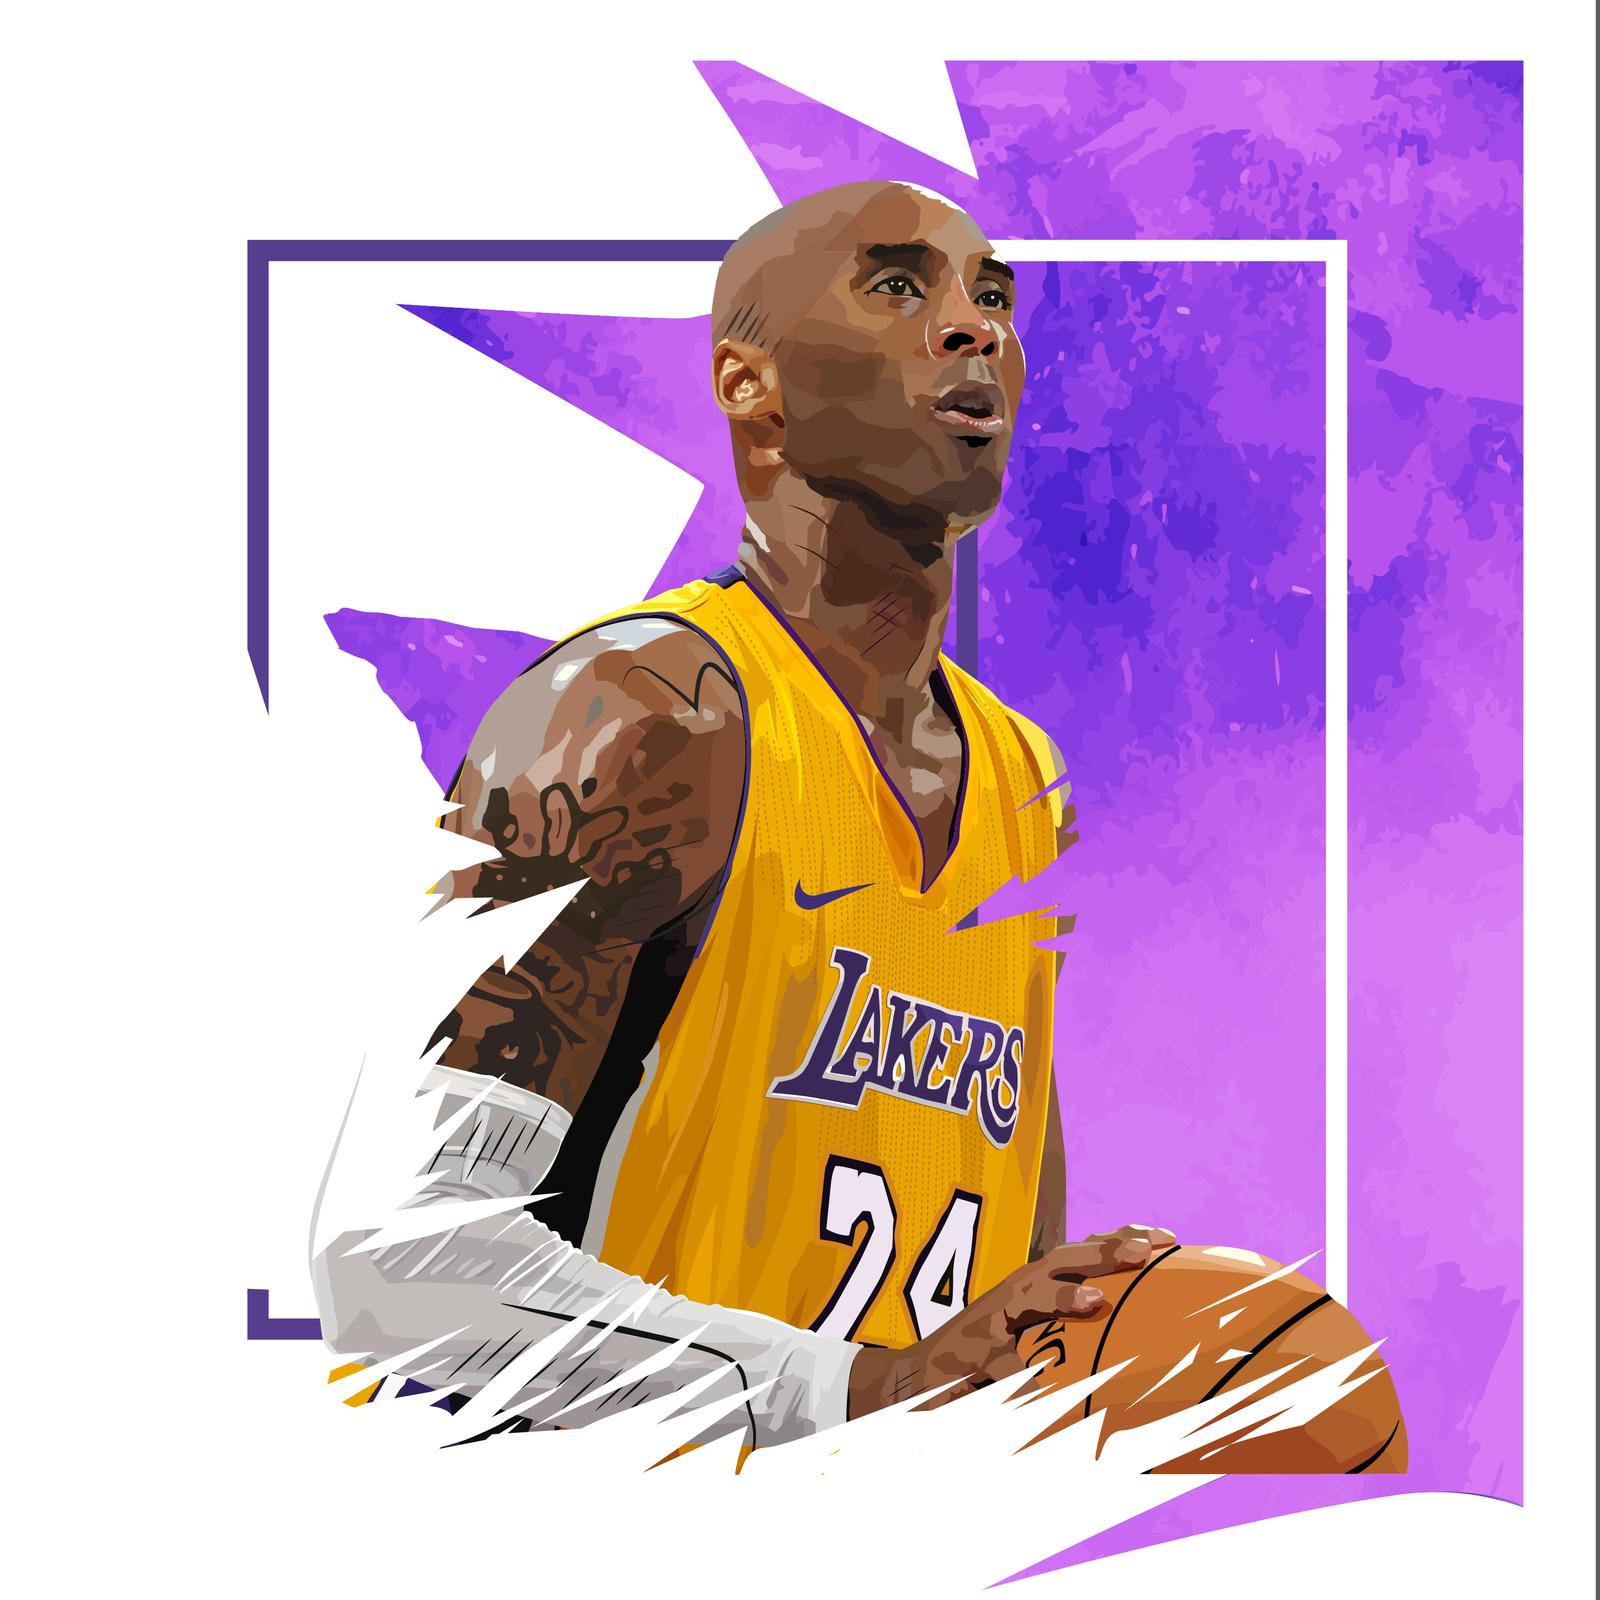 1080x1920 Kobe Bryant Iphone Wallpaper Kobe bryant